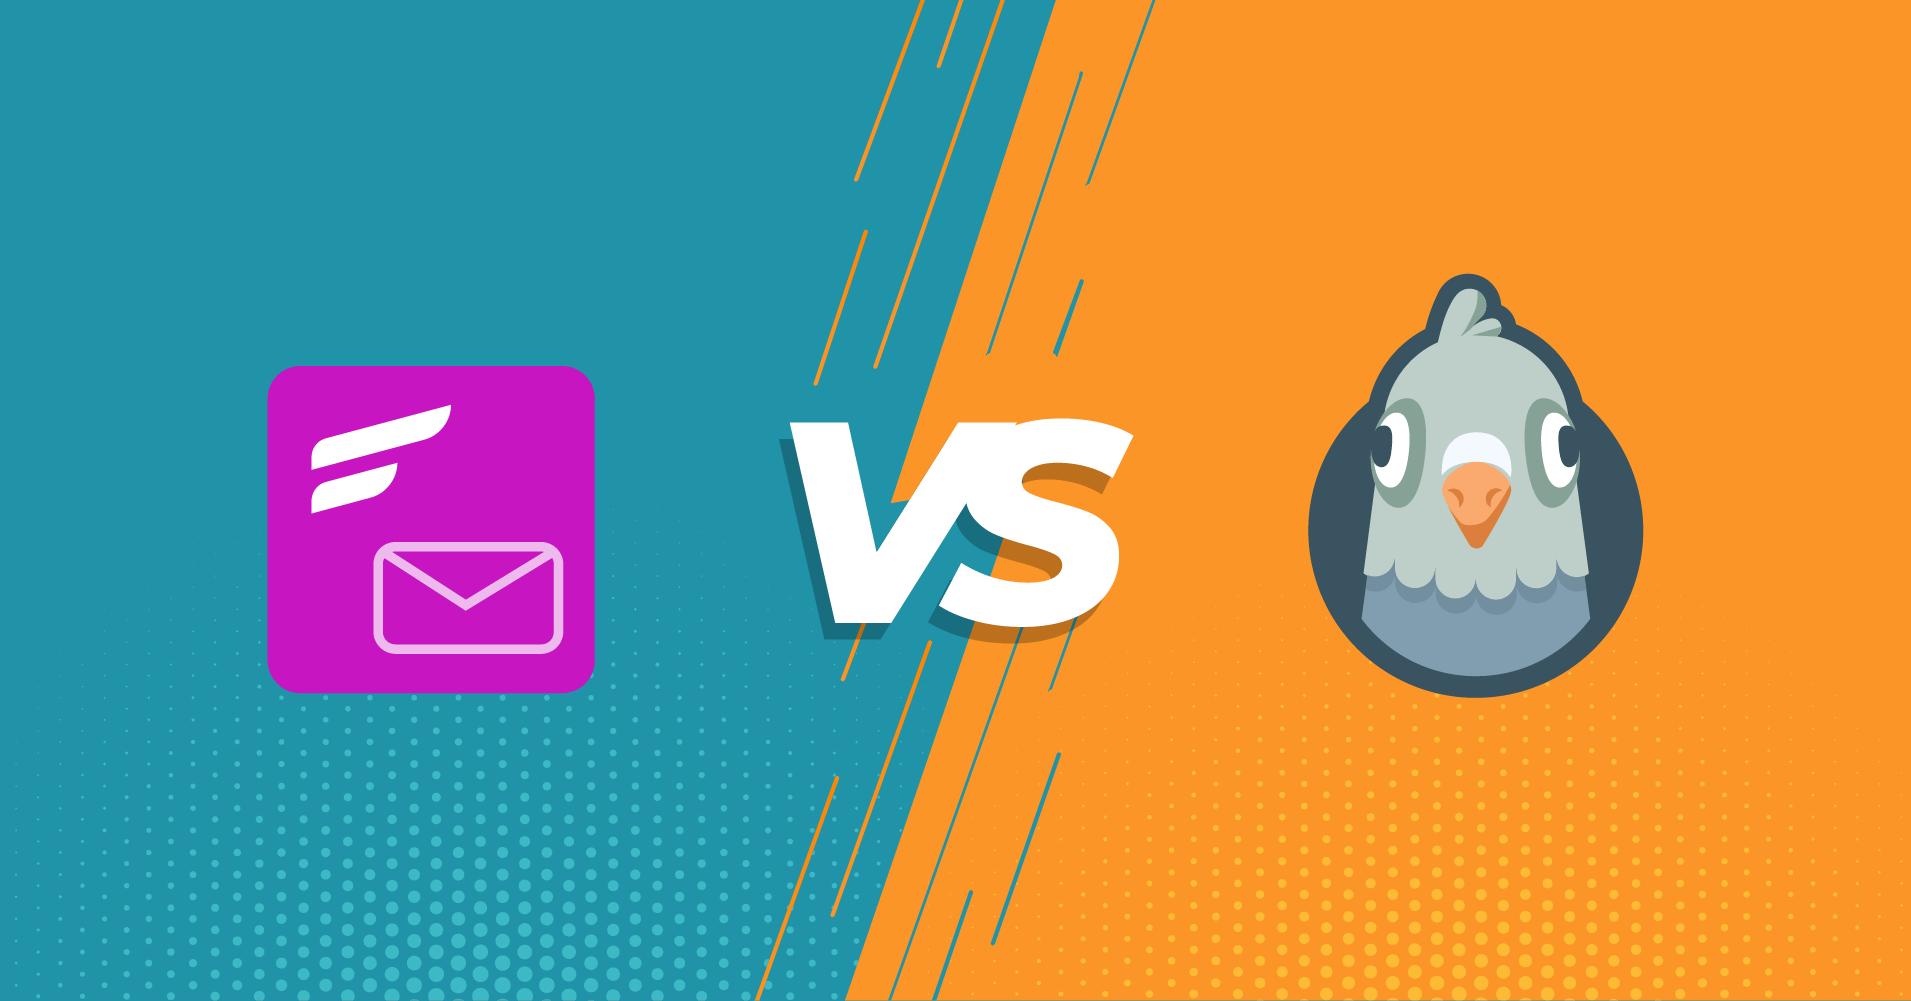 FluentSMTP vs WP Mail SMTP, wp mail smtp vs fluentsmtp, smtp plugins compared